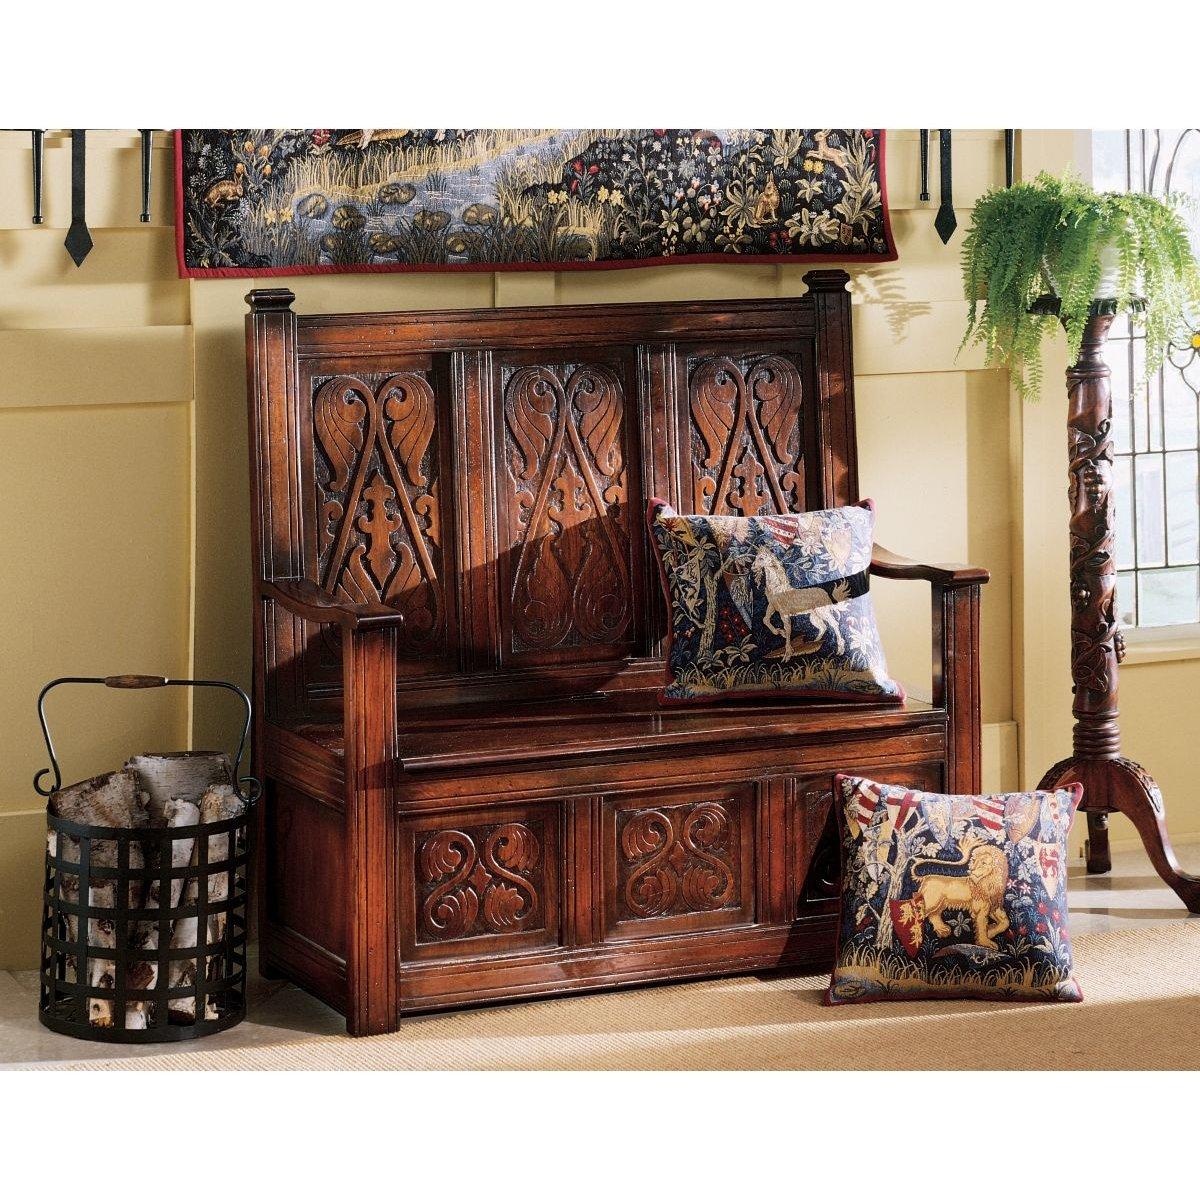 Astonishing Amazon Com Xoticbrands 16Th Century Antique Replica Hand Uwap Interior Chair Design Uwaporg